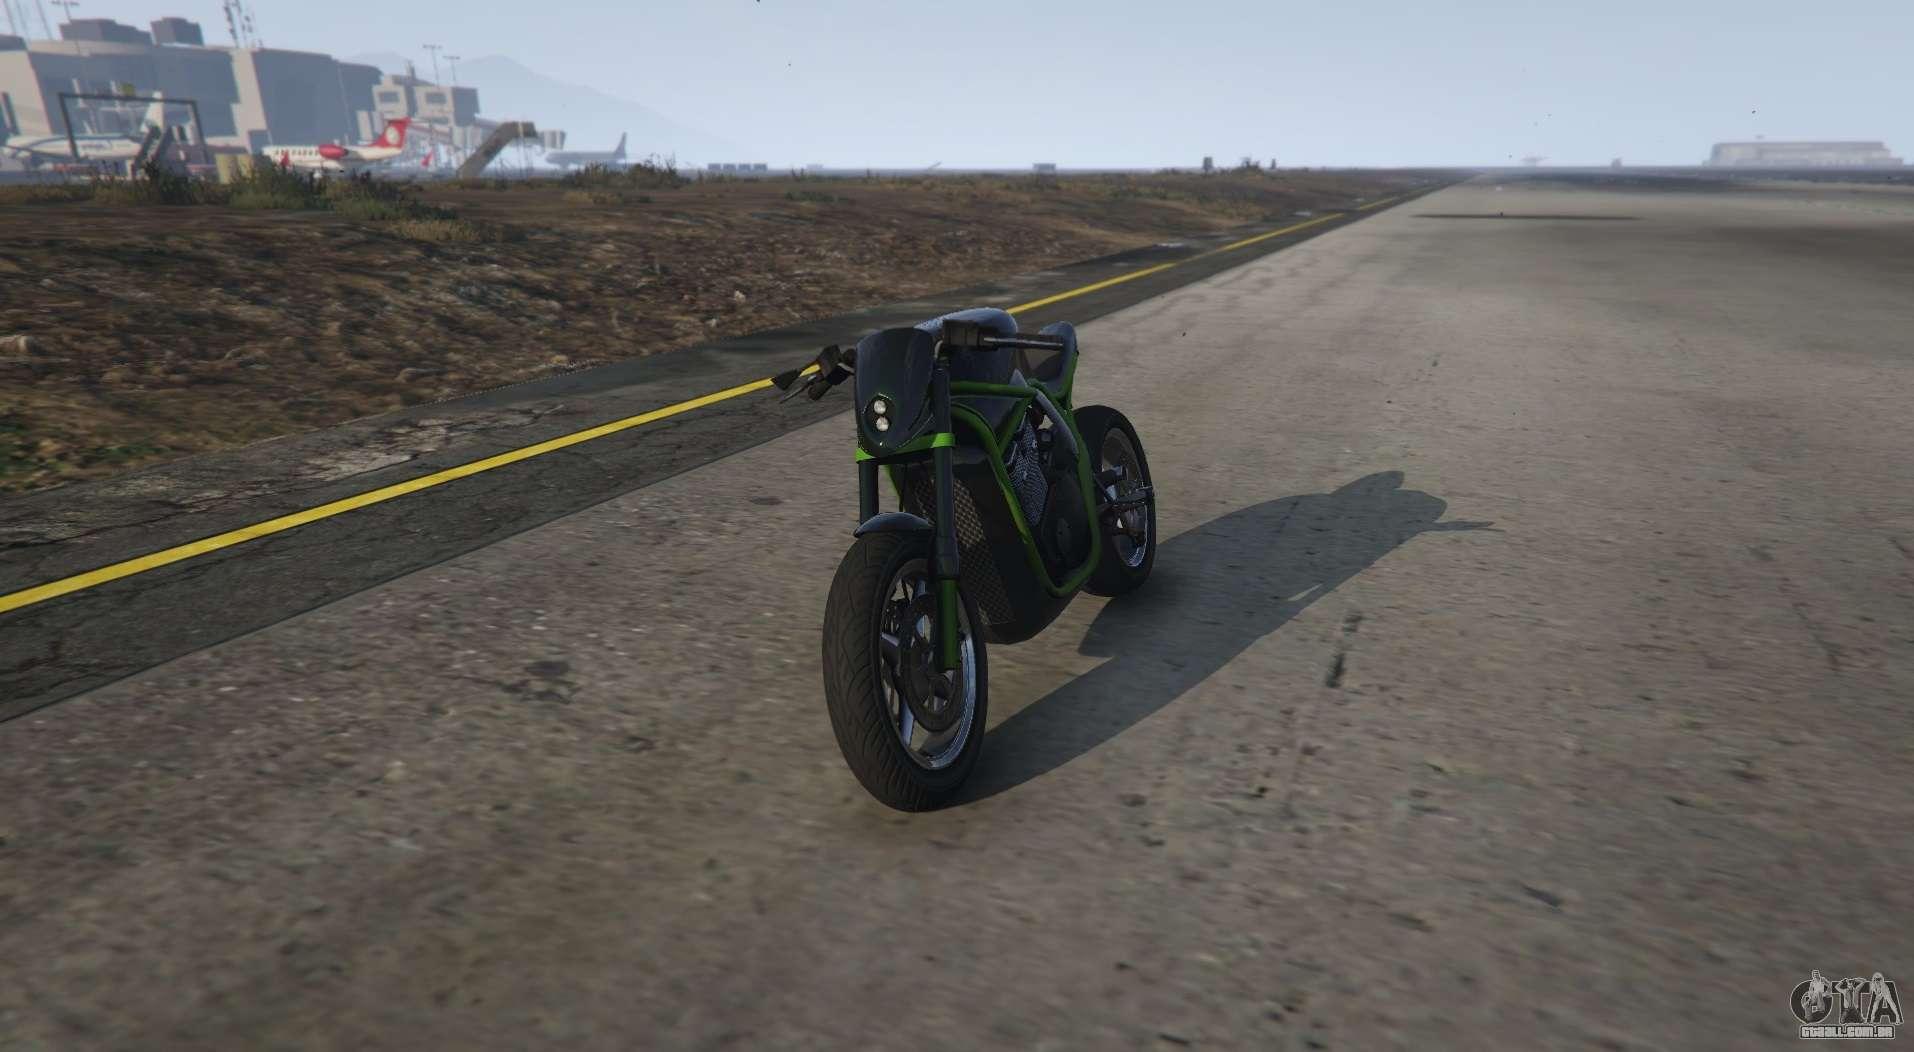 Incomum motocicleta de GTA 5 Shitzu Defiler